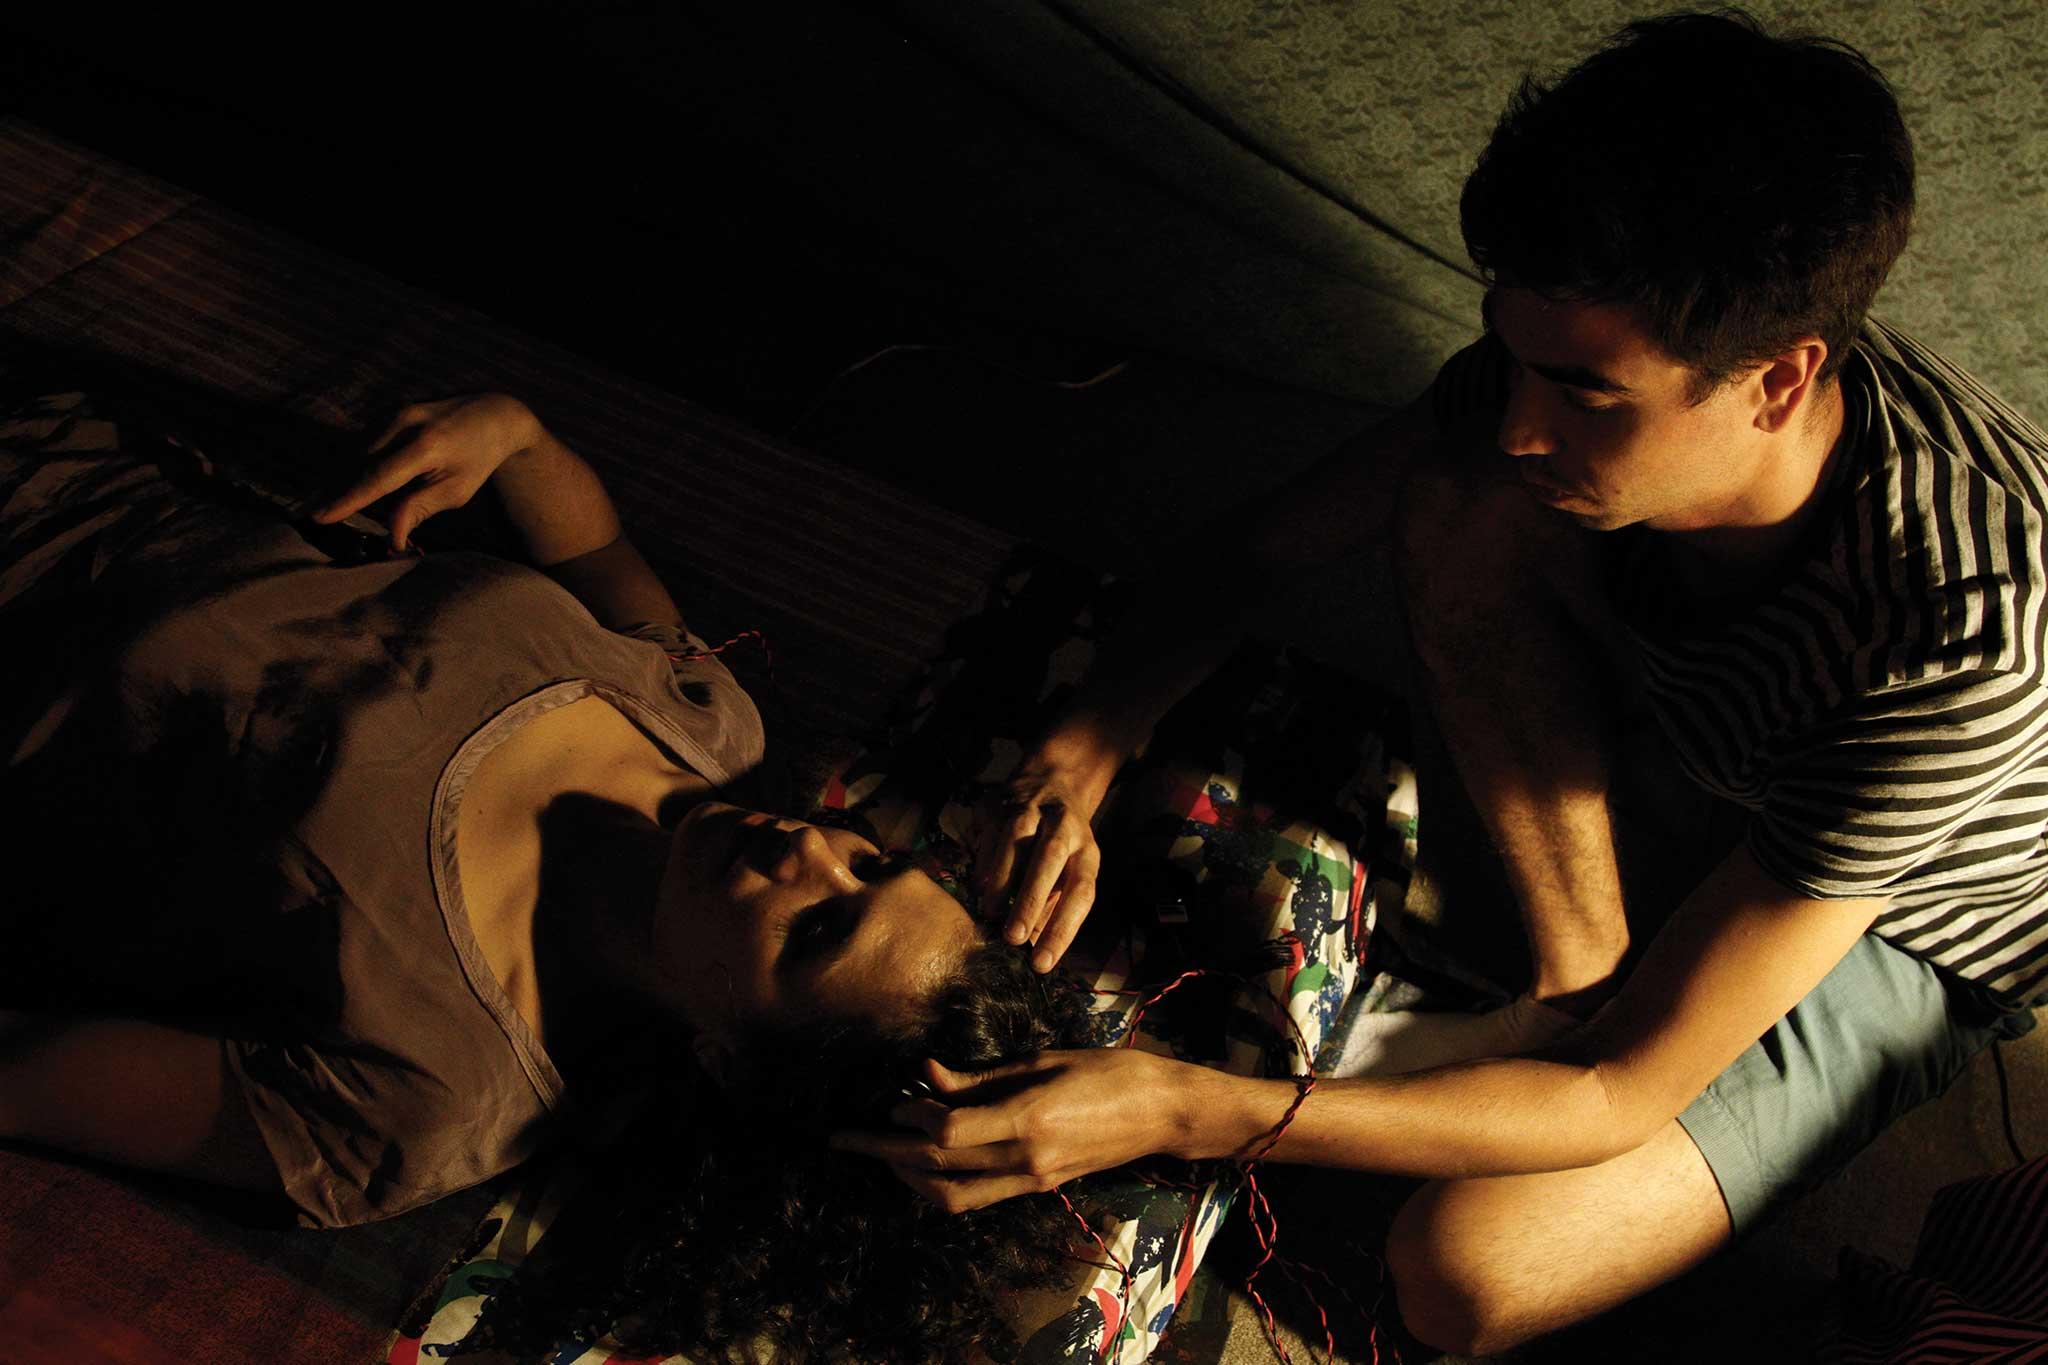 Sergei Tcherepnin's Music for One – Massage Performance